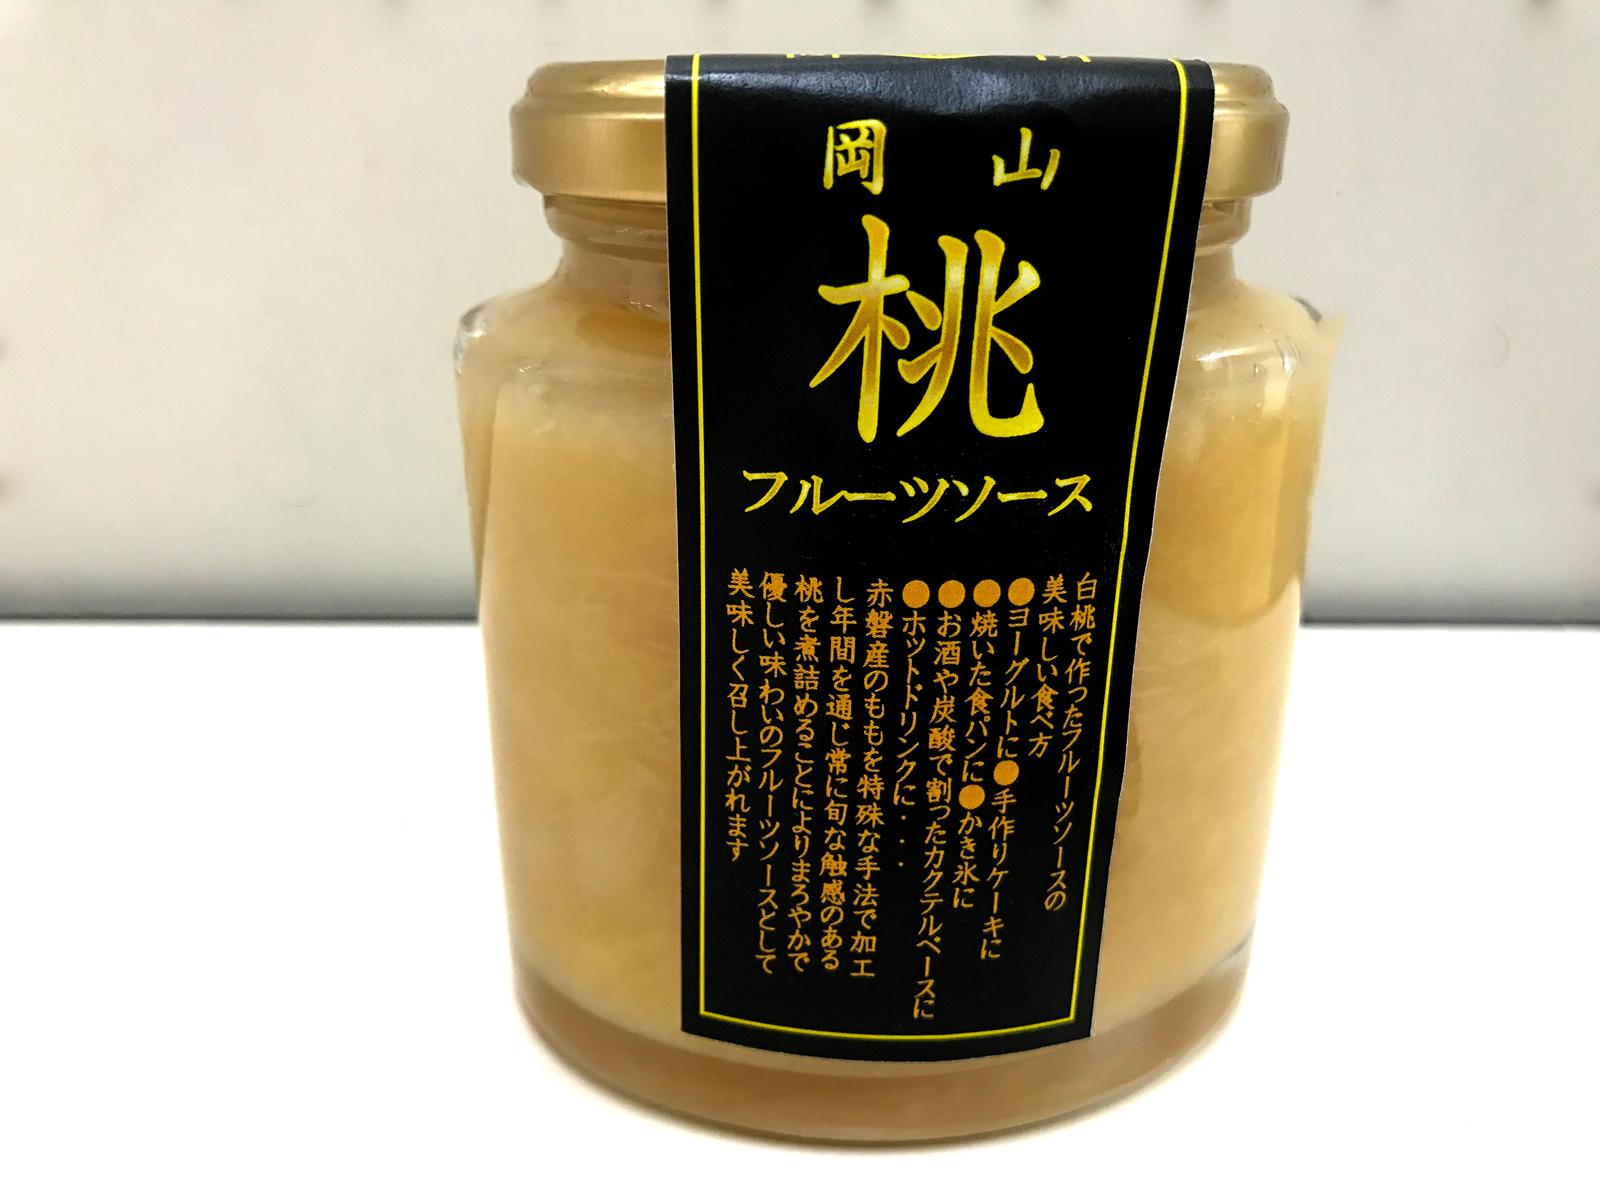 MASAKOブランド2018年新商品「岡山県産フルーツソース(桃)」6月より通販開始!